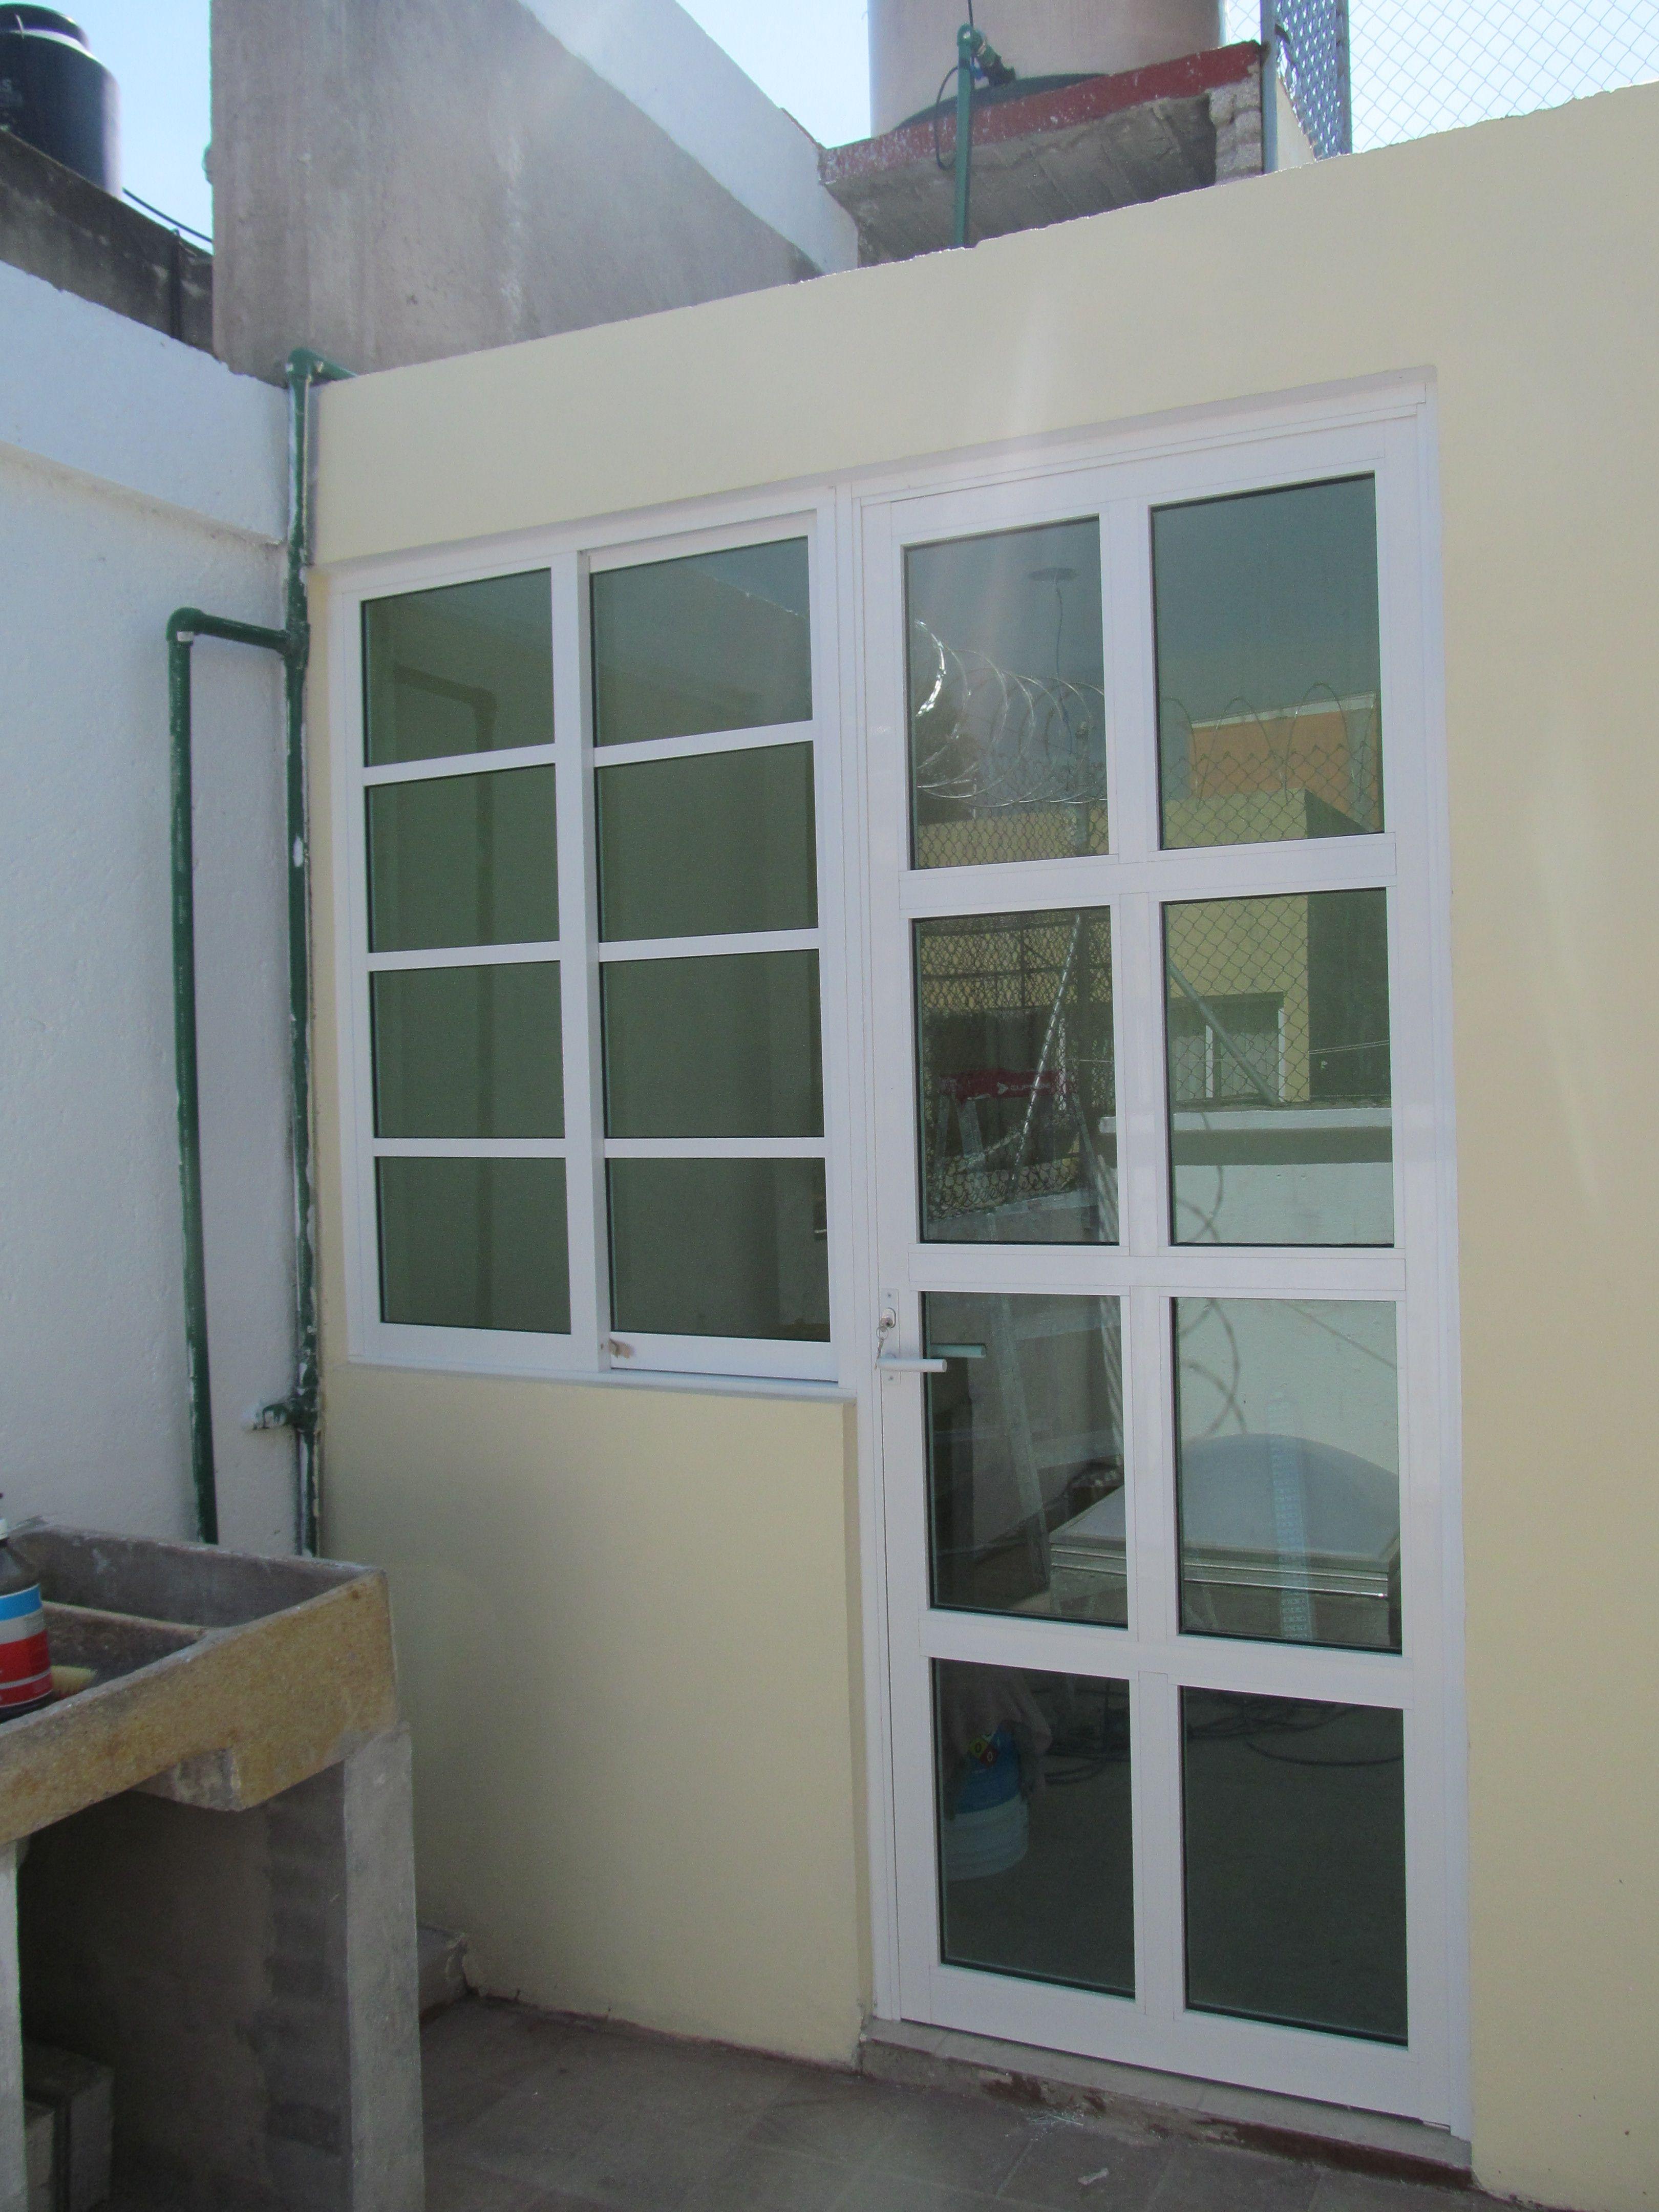 Puerta bandera de aluminio casa pinterest aluminio for Puertas de aluminio